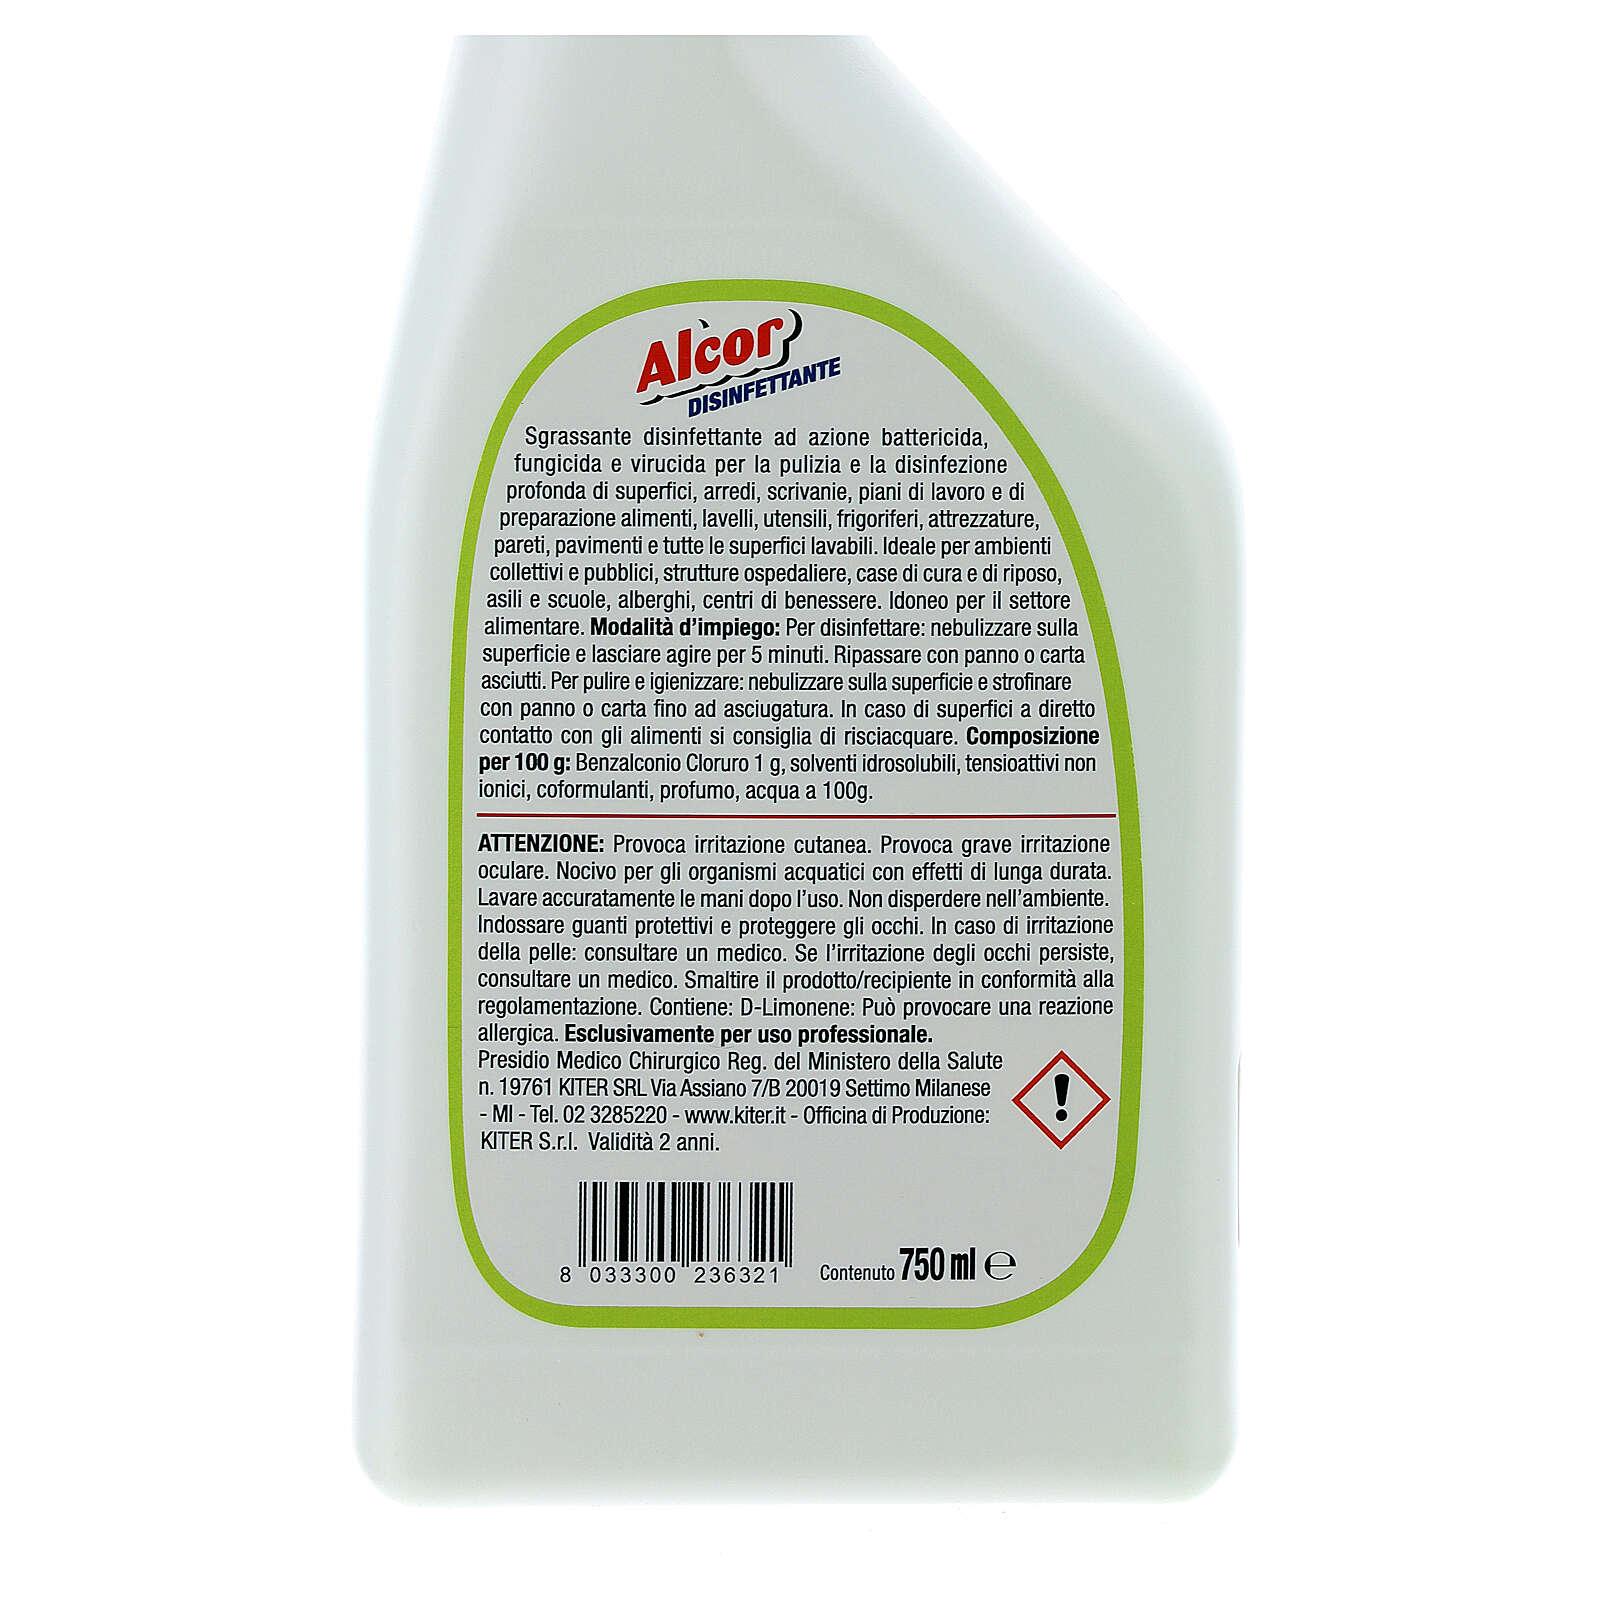 Disinfectant spray professional-grade, Alcor 750 ml 3